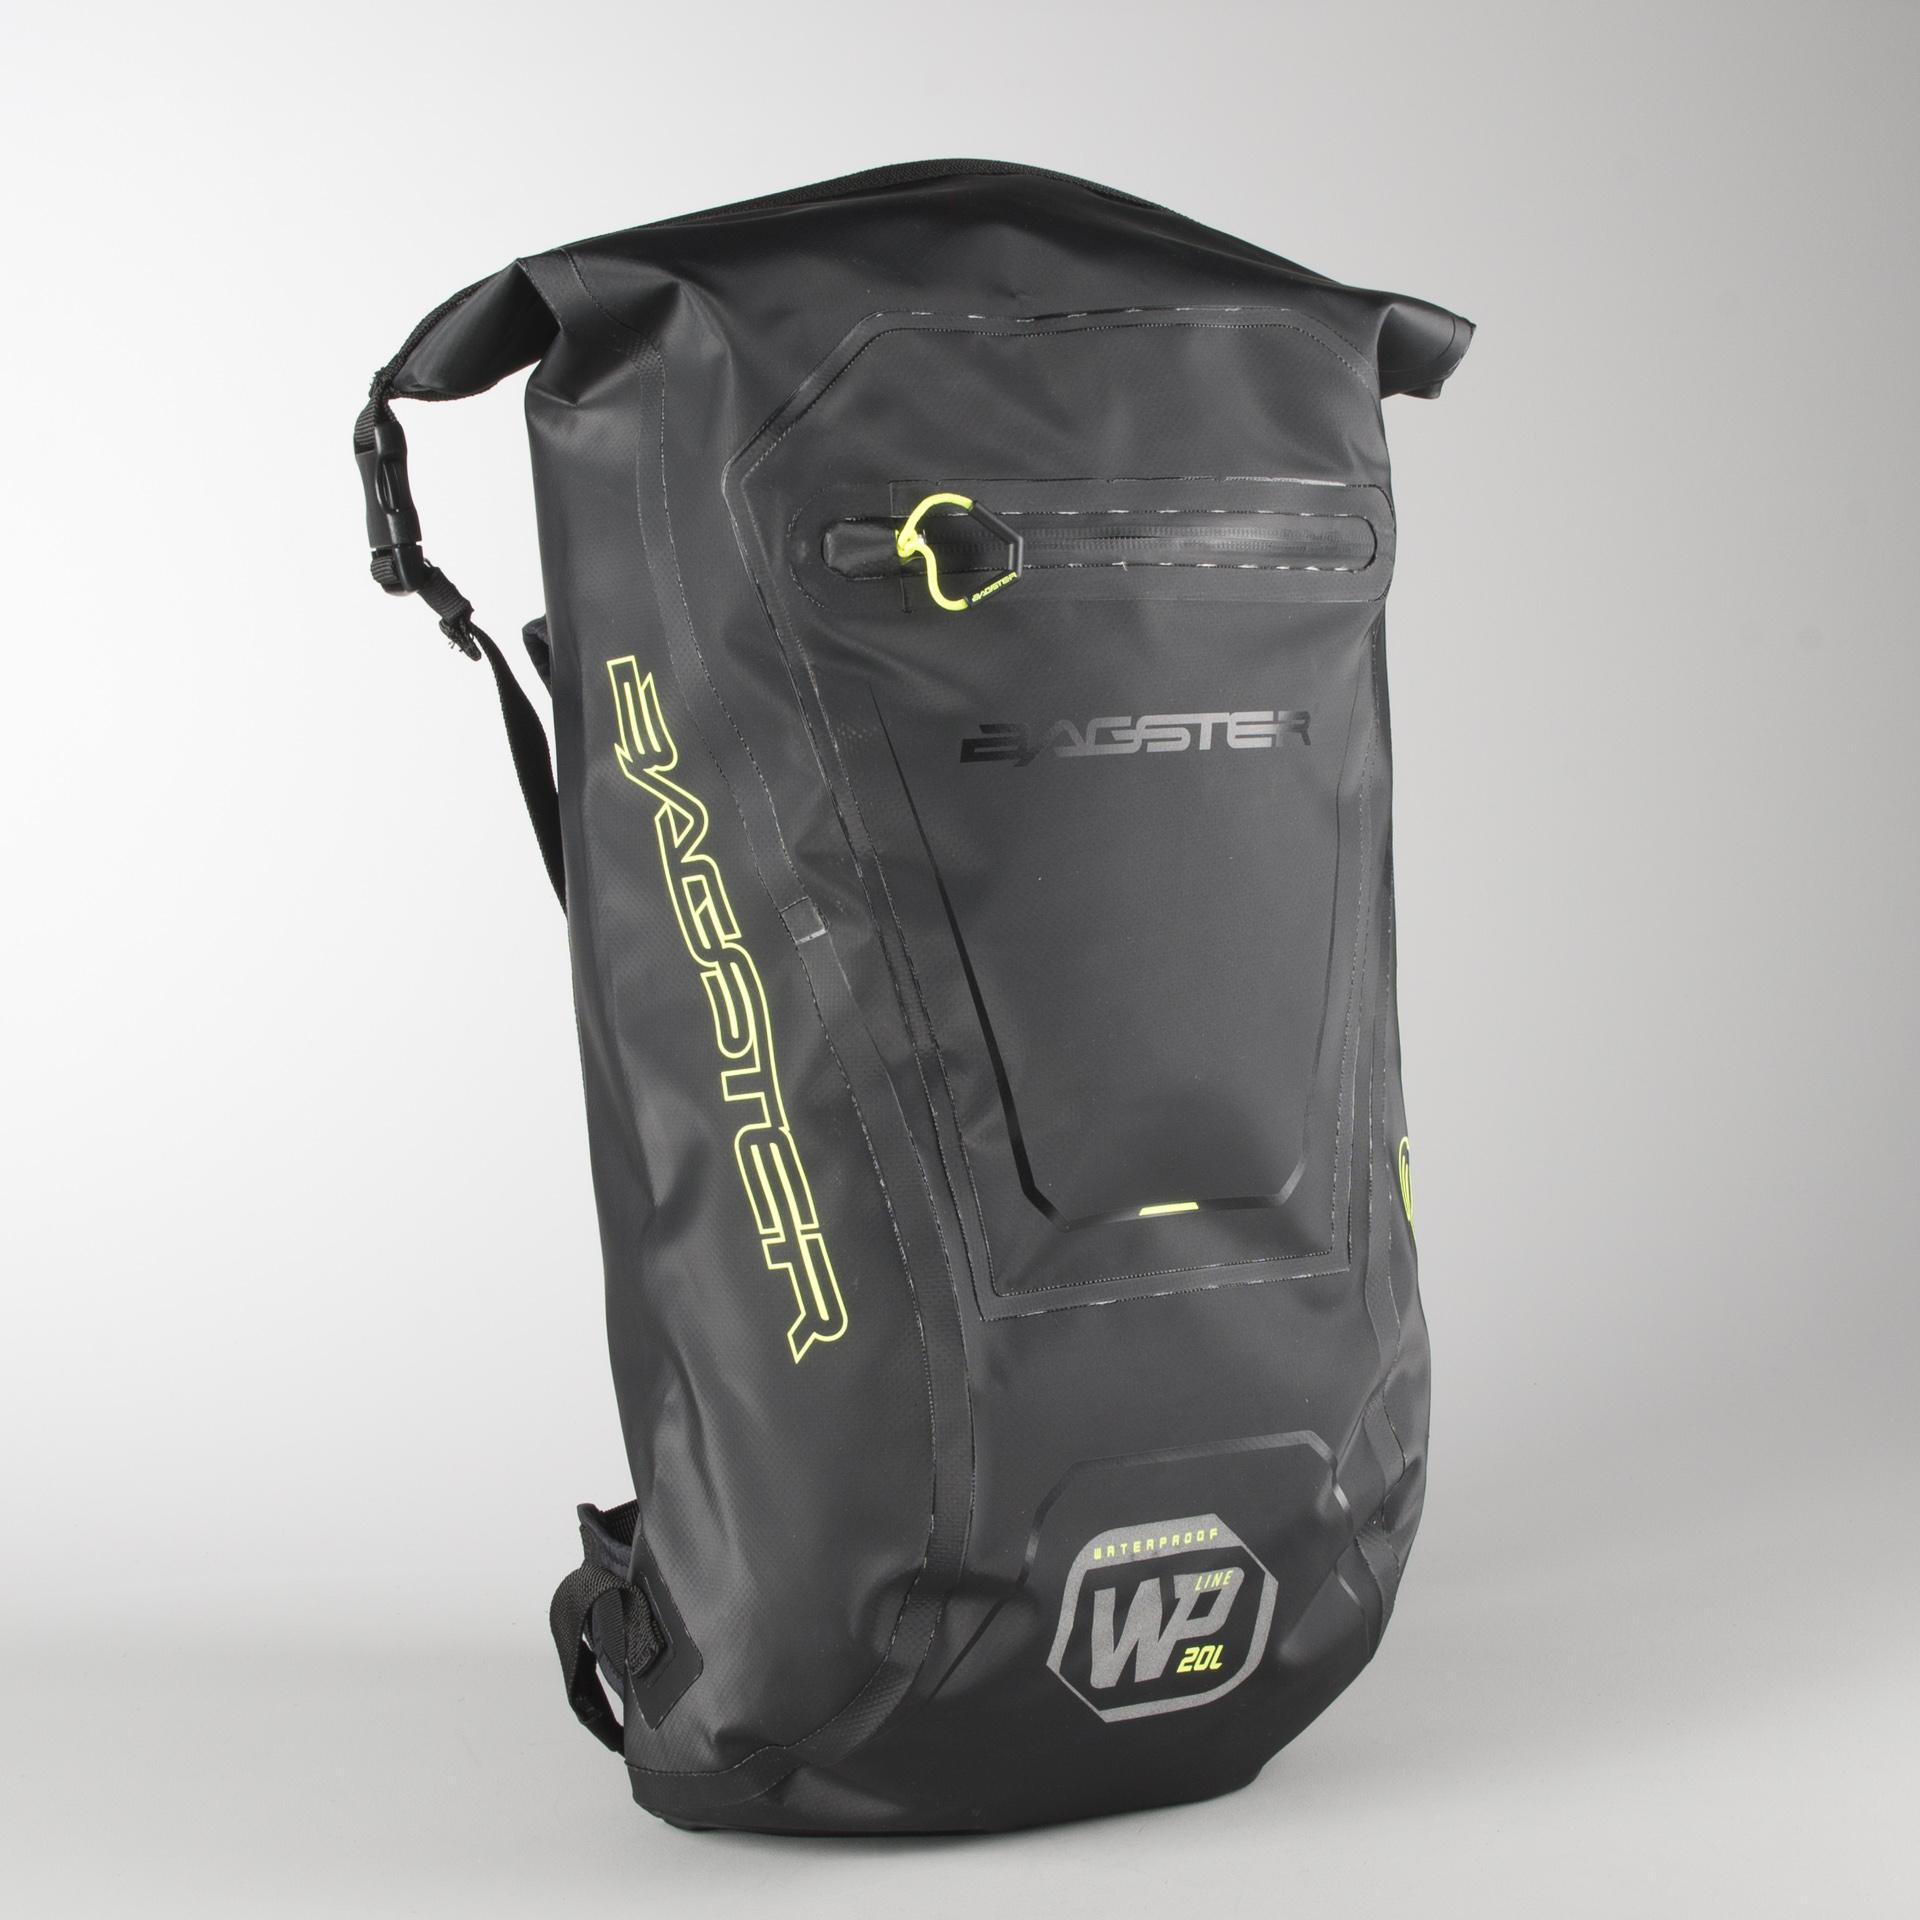 Bagster WP20 Backpack Black Grey Now 7% Savings XLmoto.eu